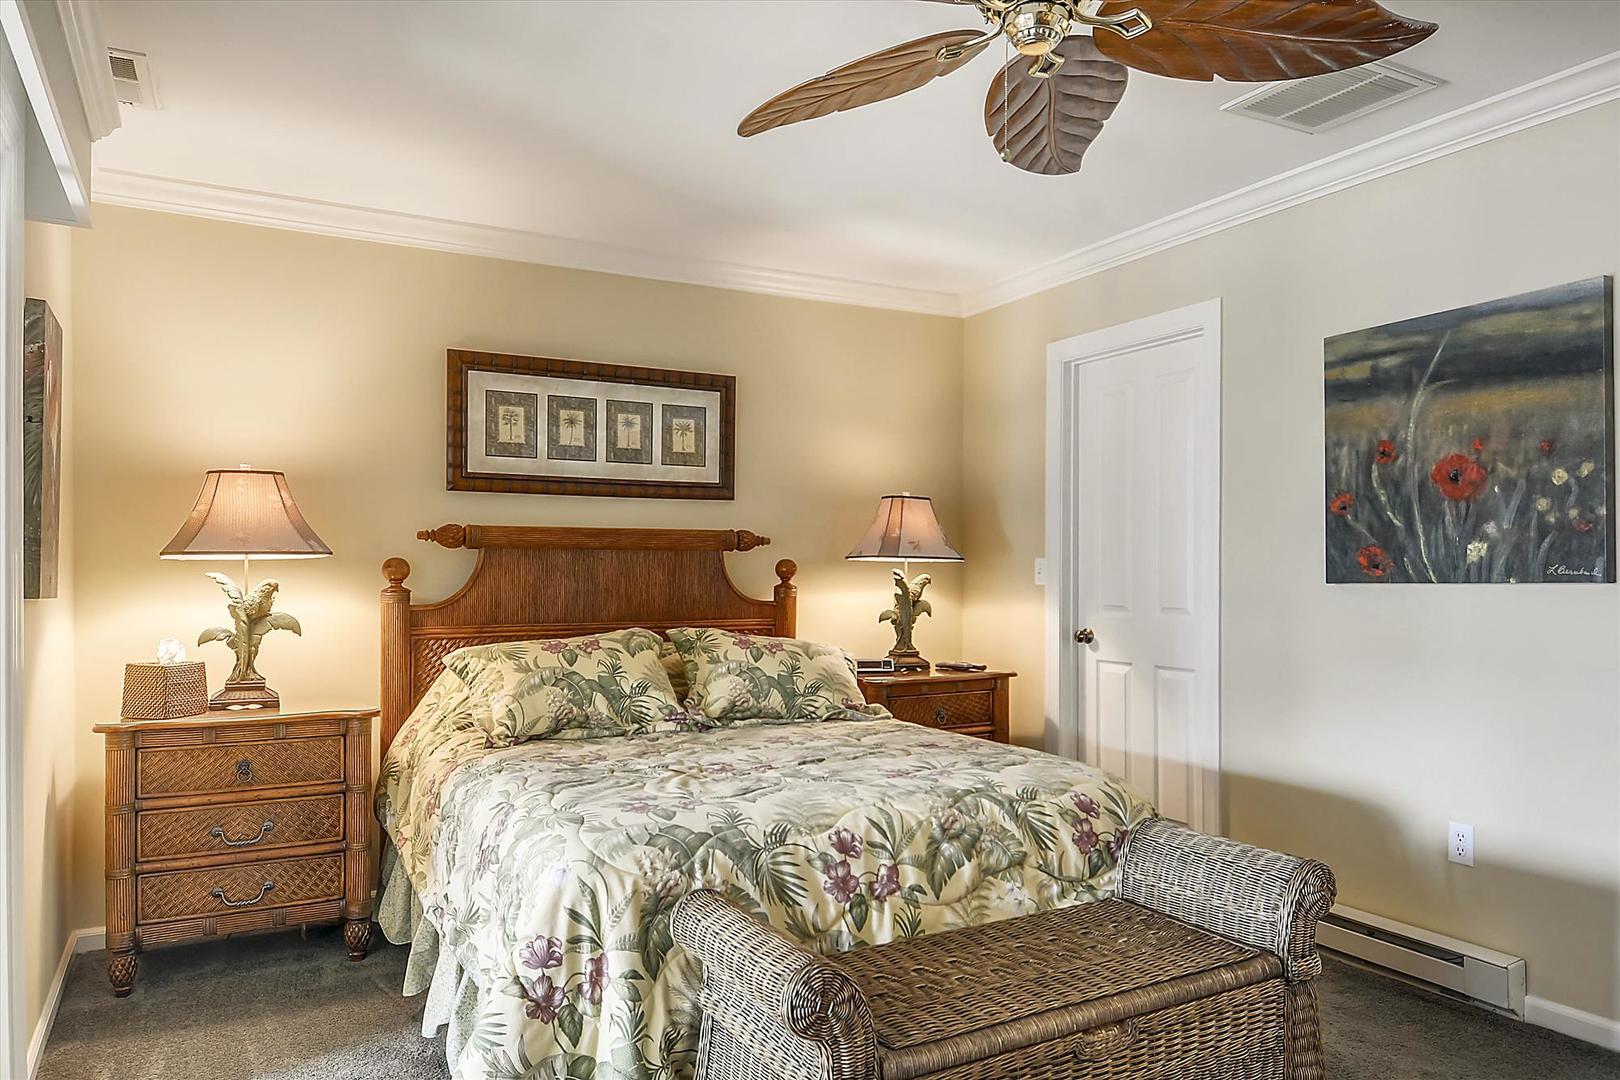 Bayville Shores 1169 - Lower Level Bedroom